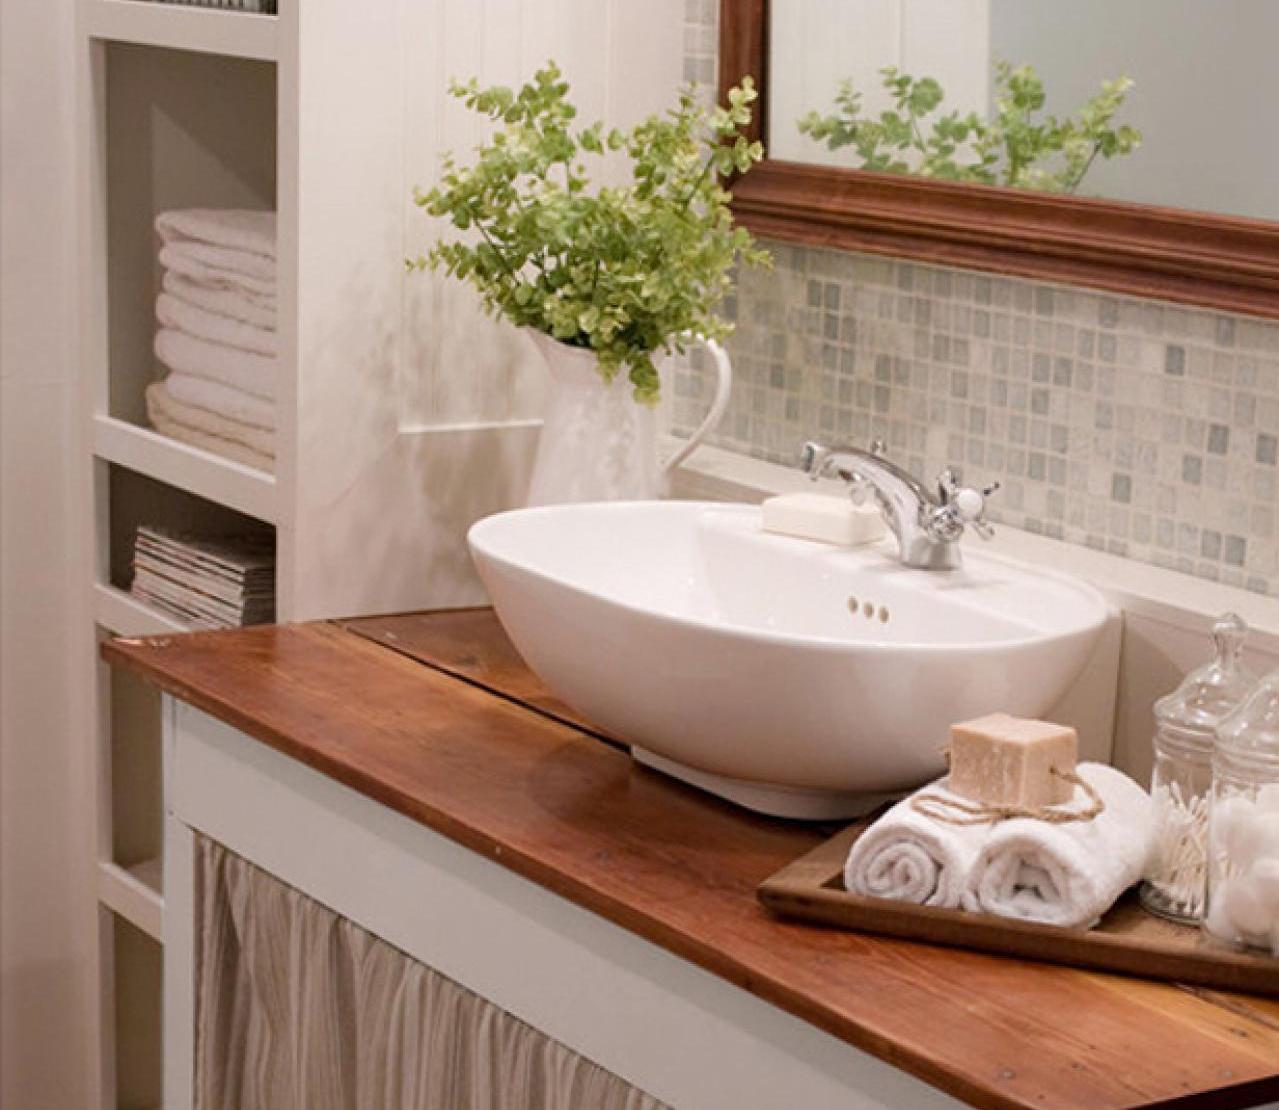 Раковина для ванной встроенная